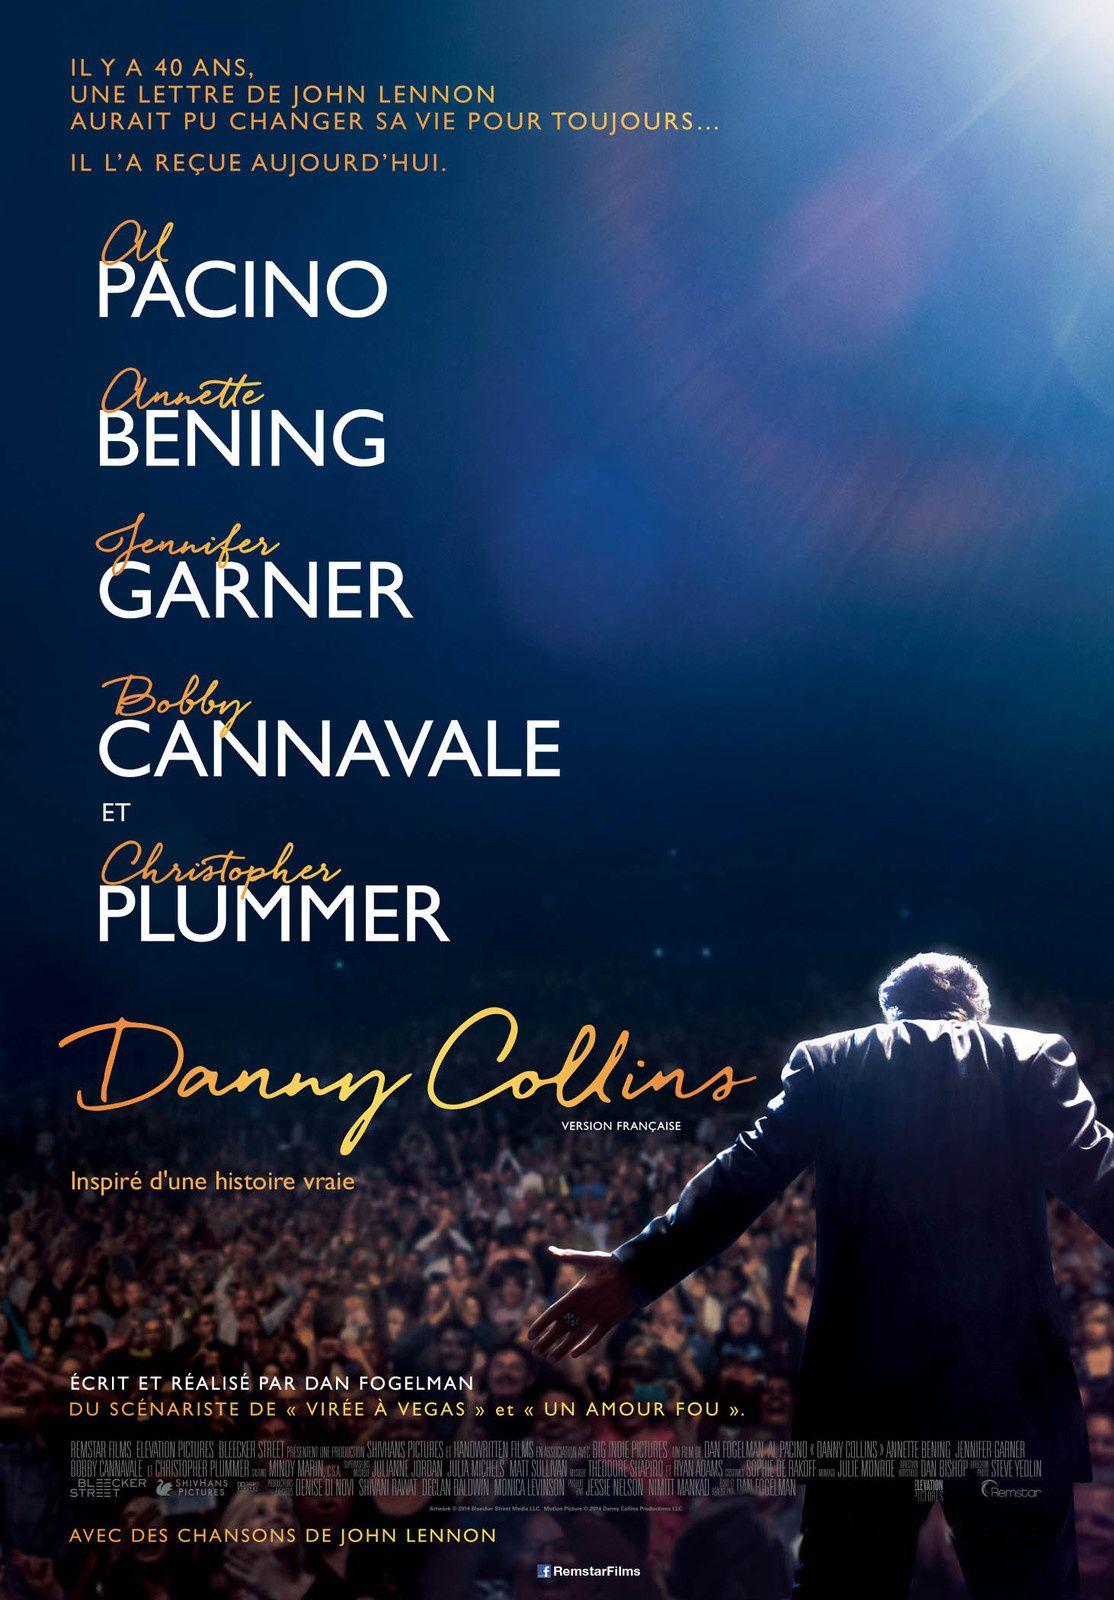 Imagine (Danny Collins) (BANDE ANNONCE VO 2015) avec Al Pacino, Annette Bening